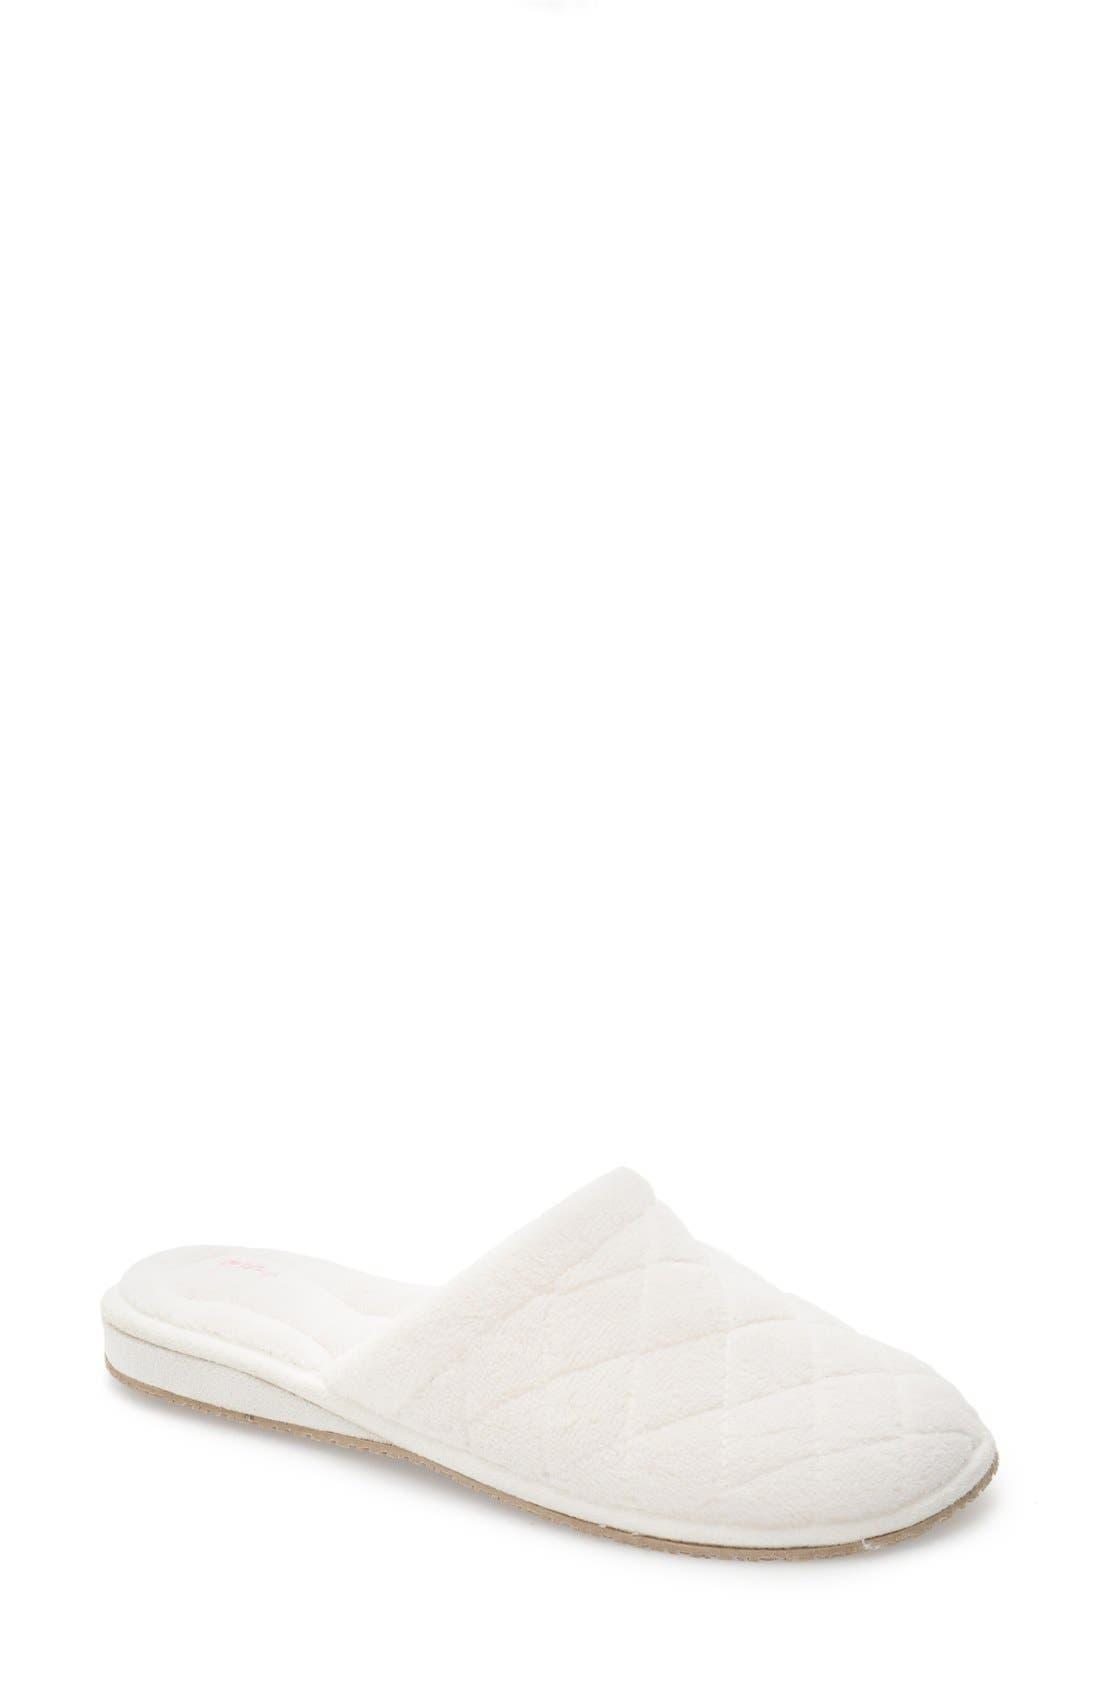 'Aria' Plush Slipper,                         Main,                         color, White Polyester